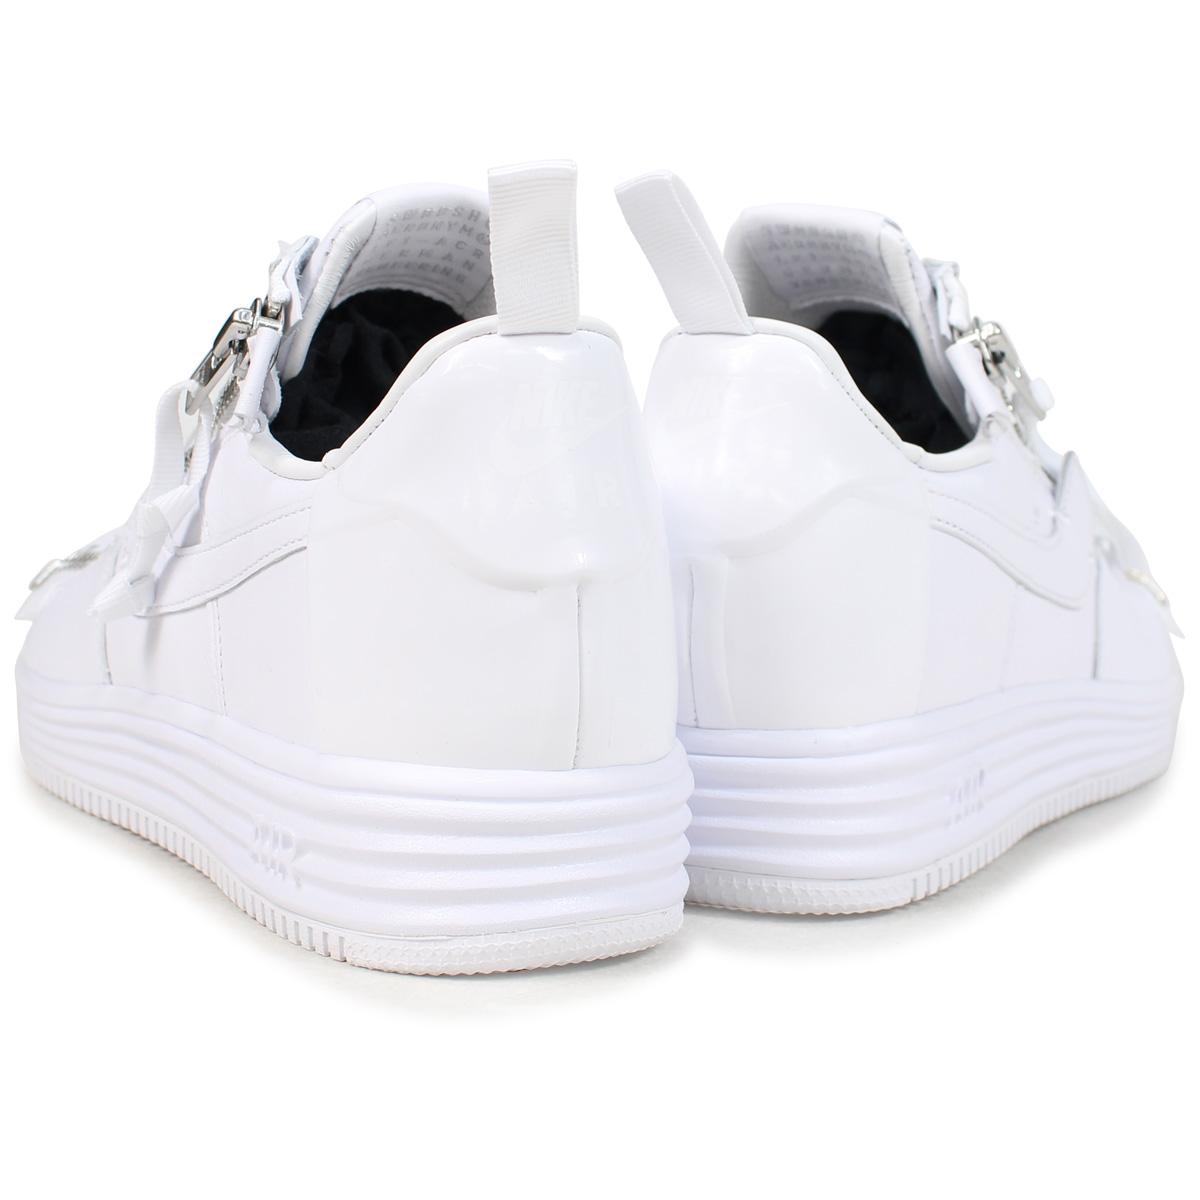 ... shop nike lunar force 1 acronym 17 nike luna force 1 sneakers men aj6247  100 white 4b80aaf8c